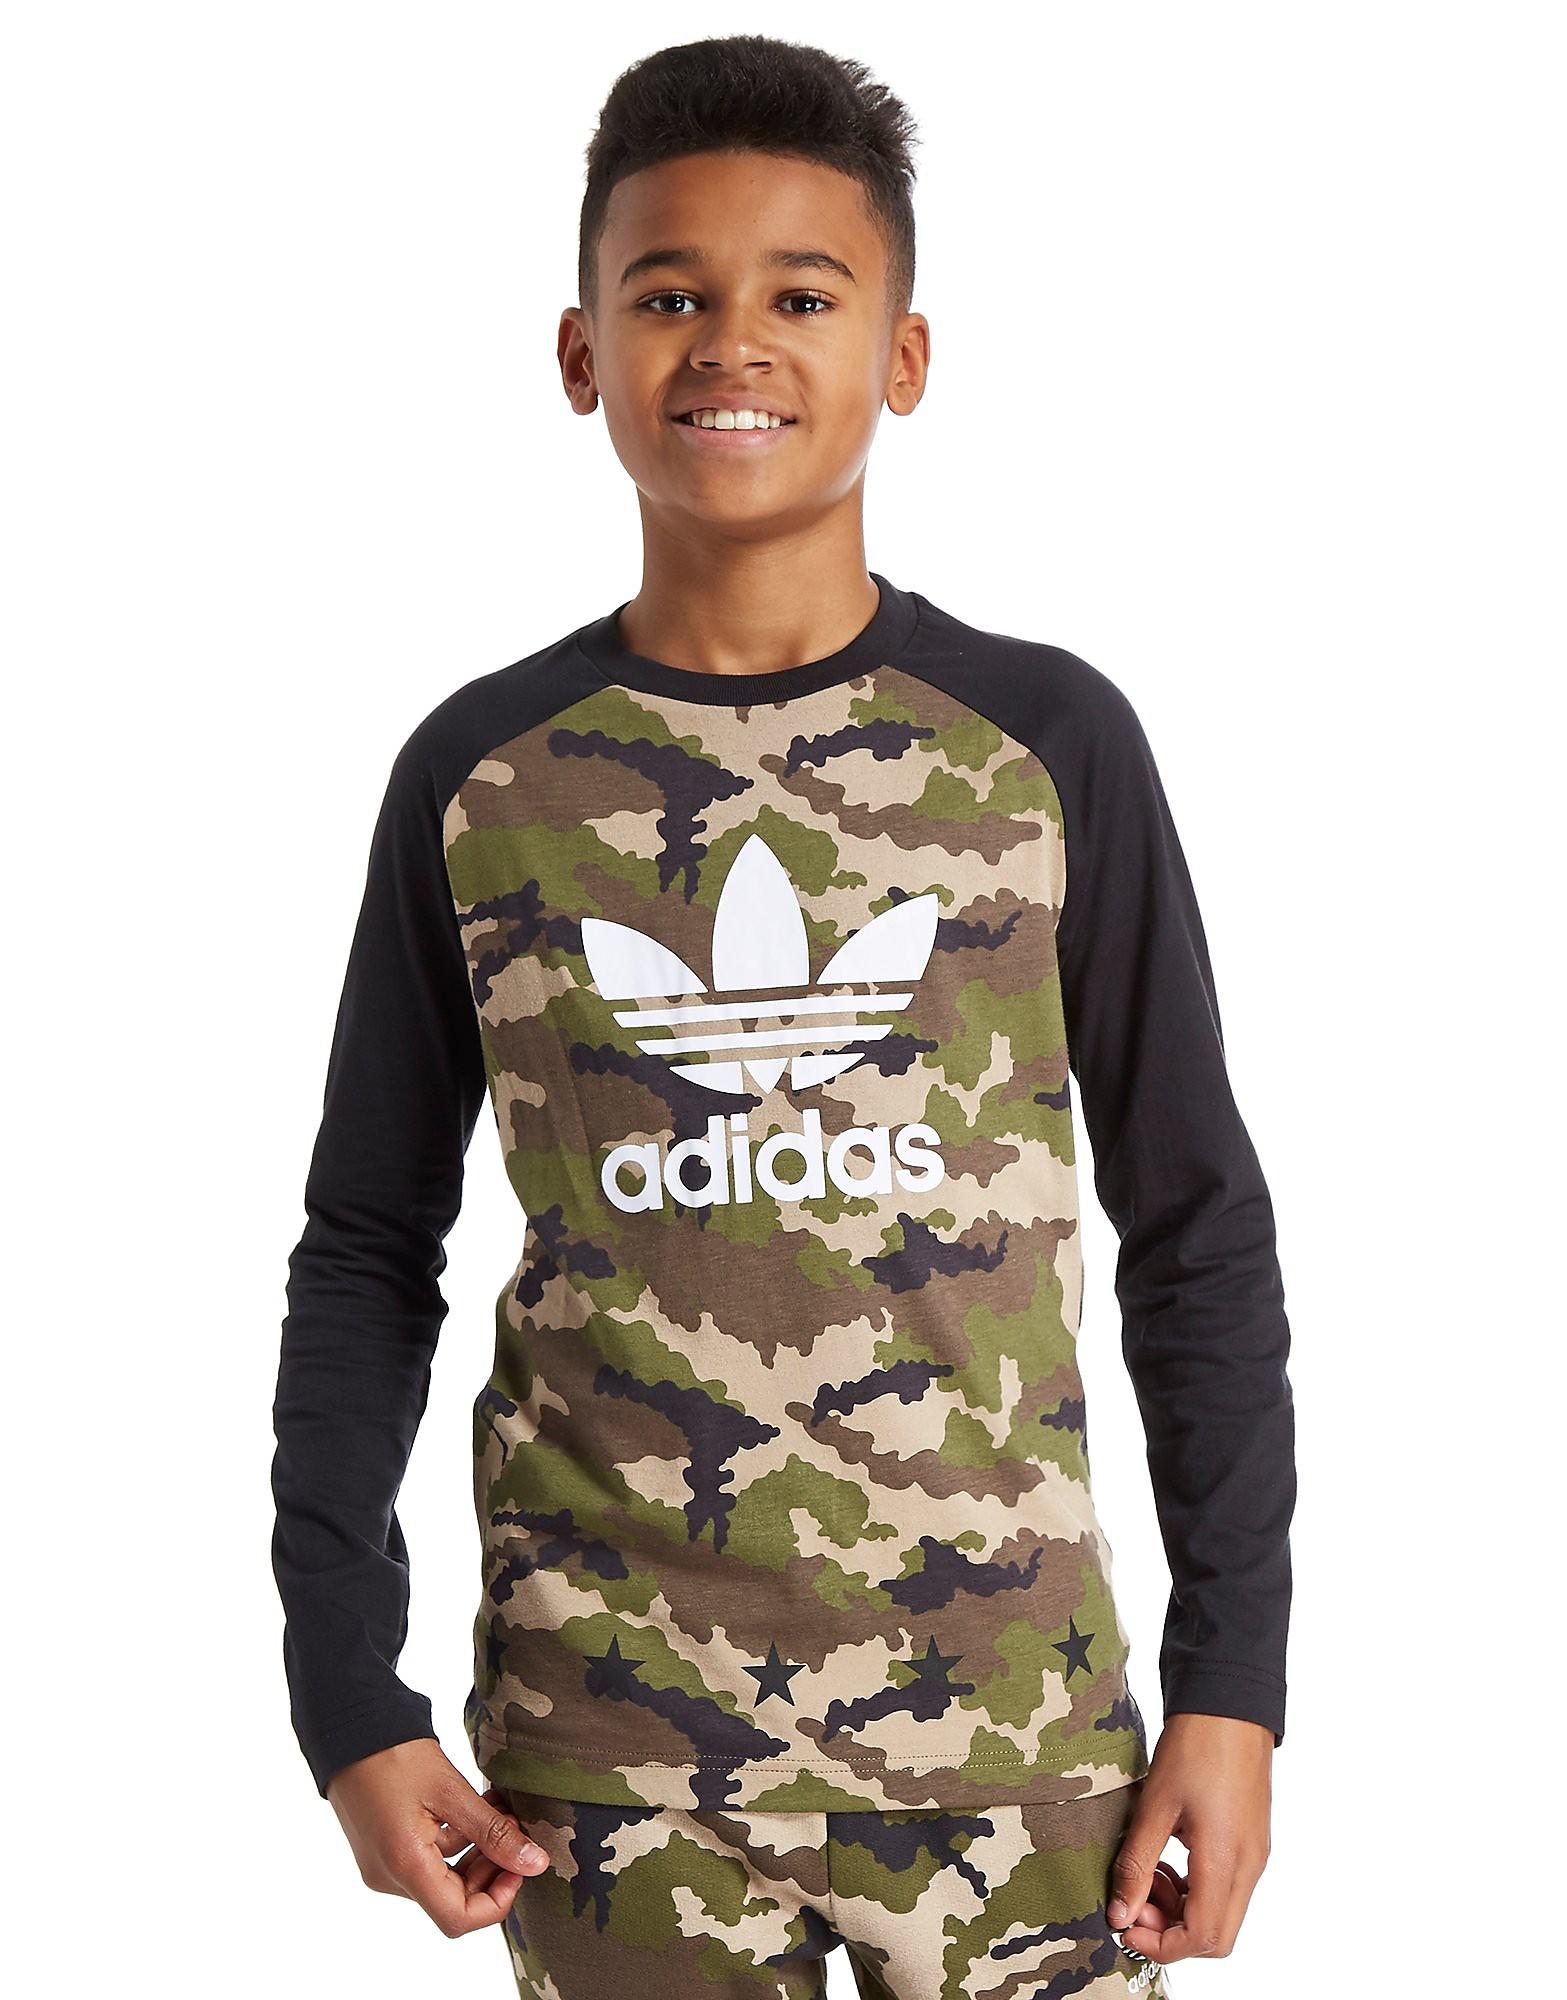 adidas Originals Camo Longsleeve T-Shirt Junior